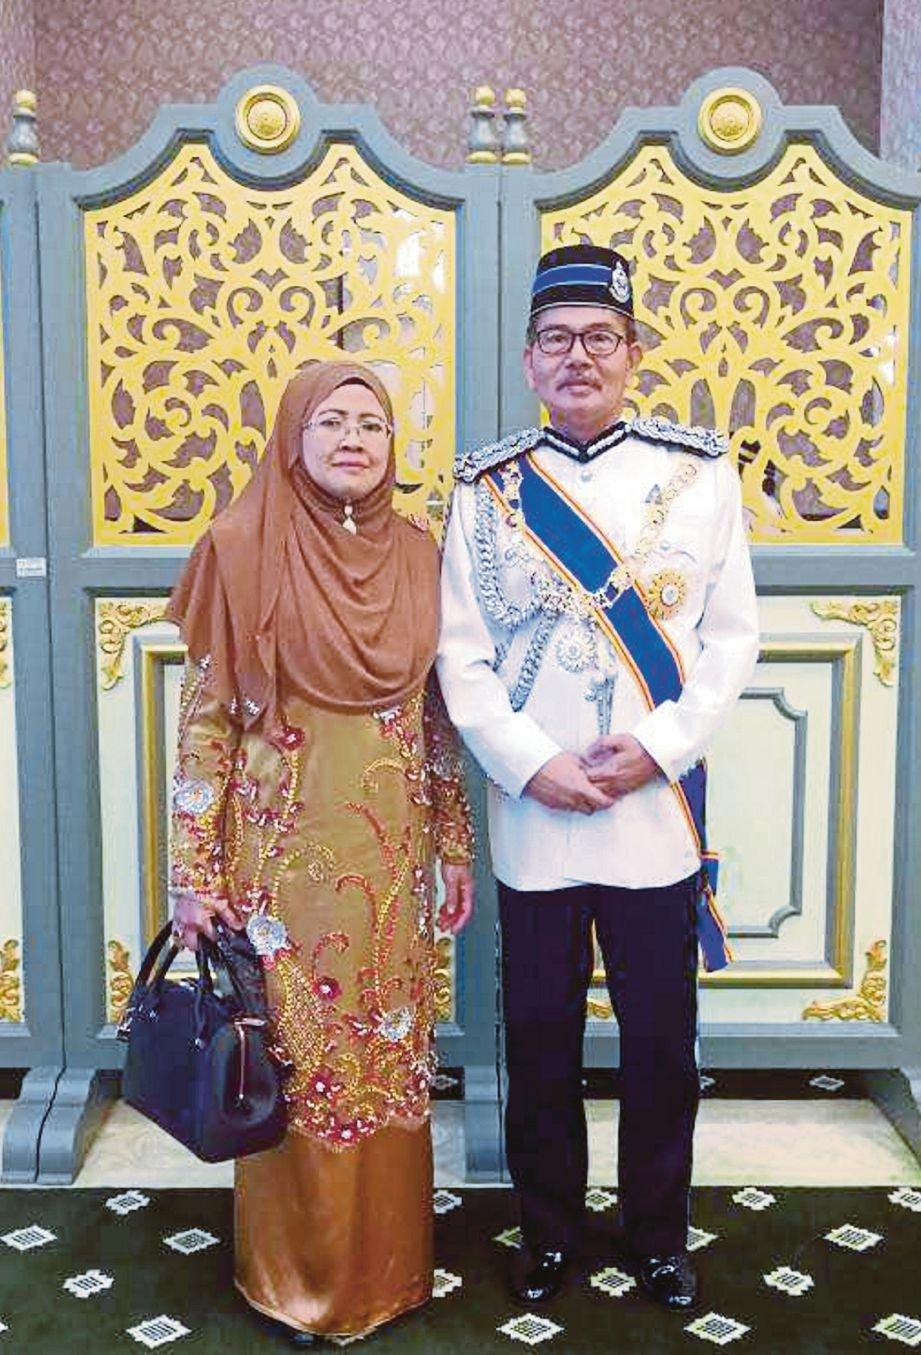 Mazlan menerima  anugerah darjah kebesaran  SMW  yang membawa gelaran Datuk Seri.